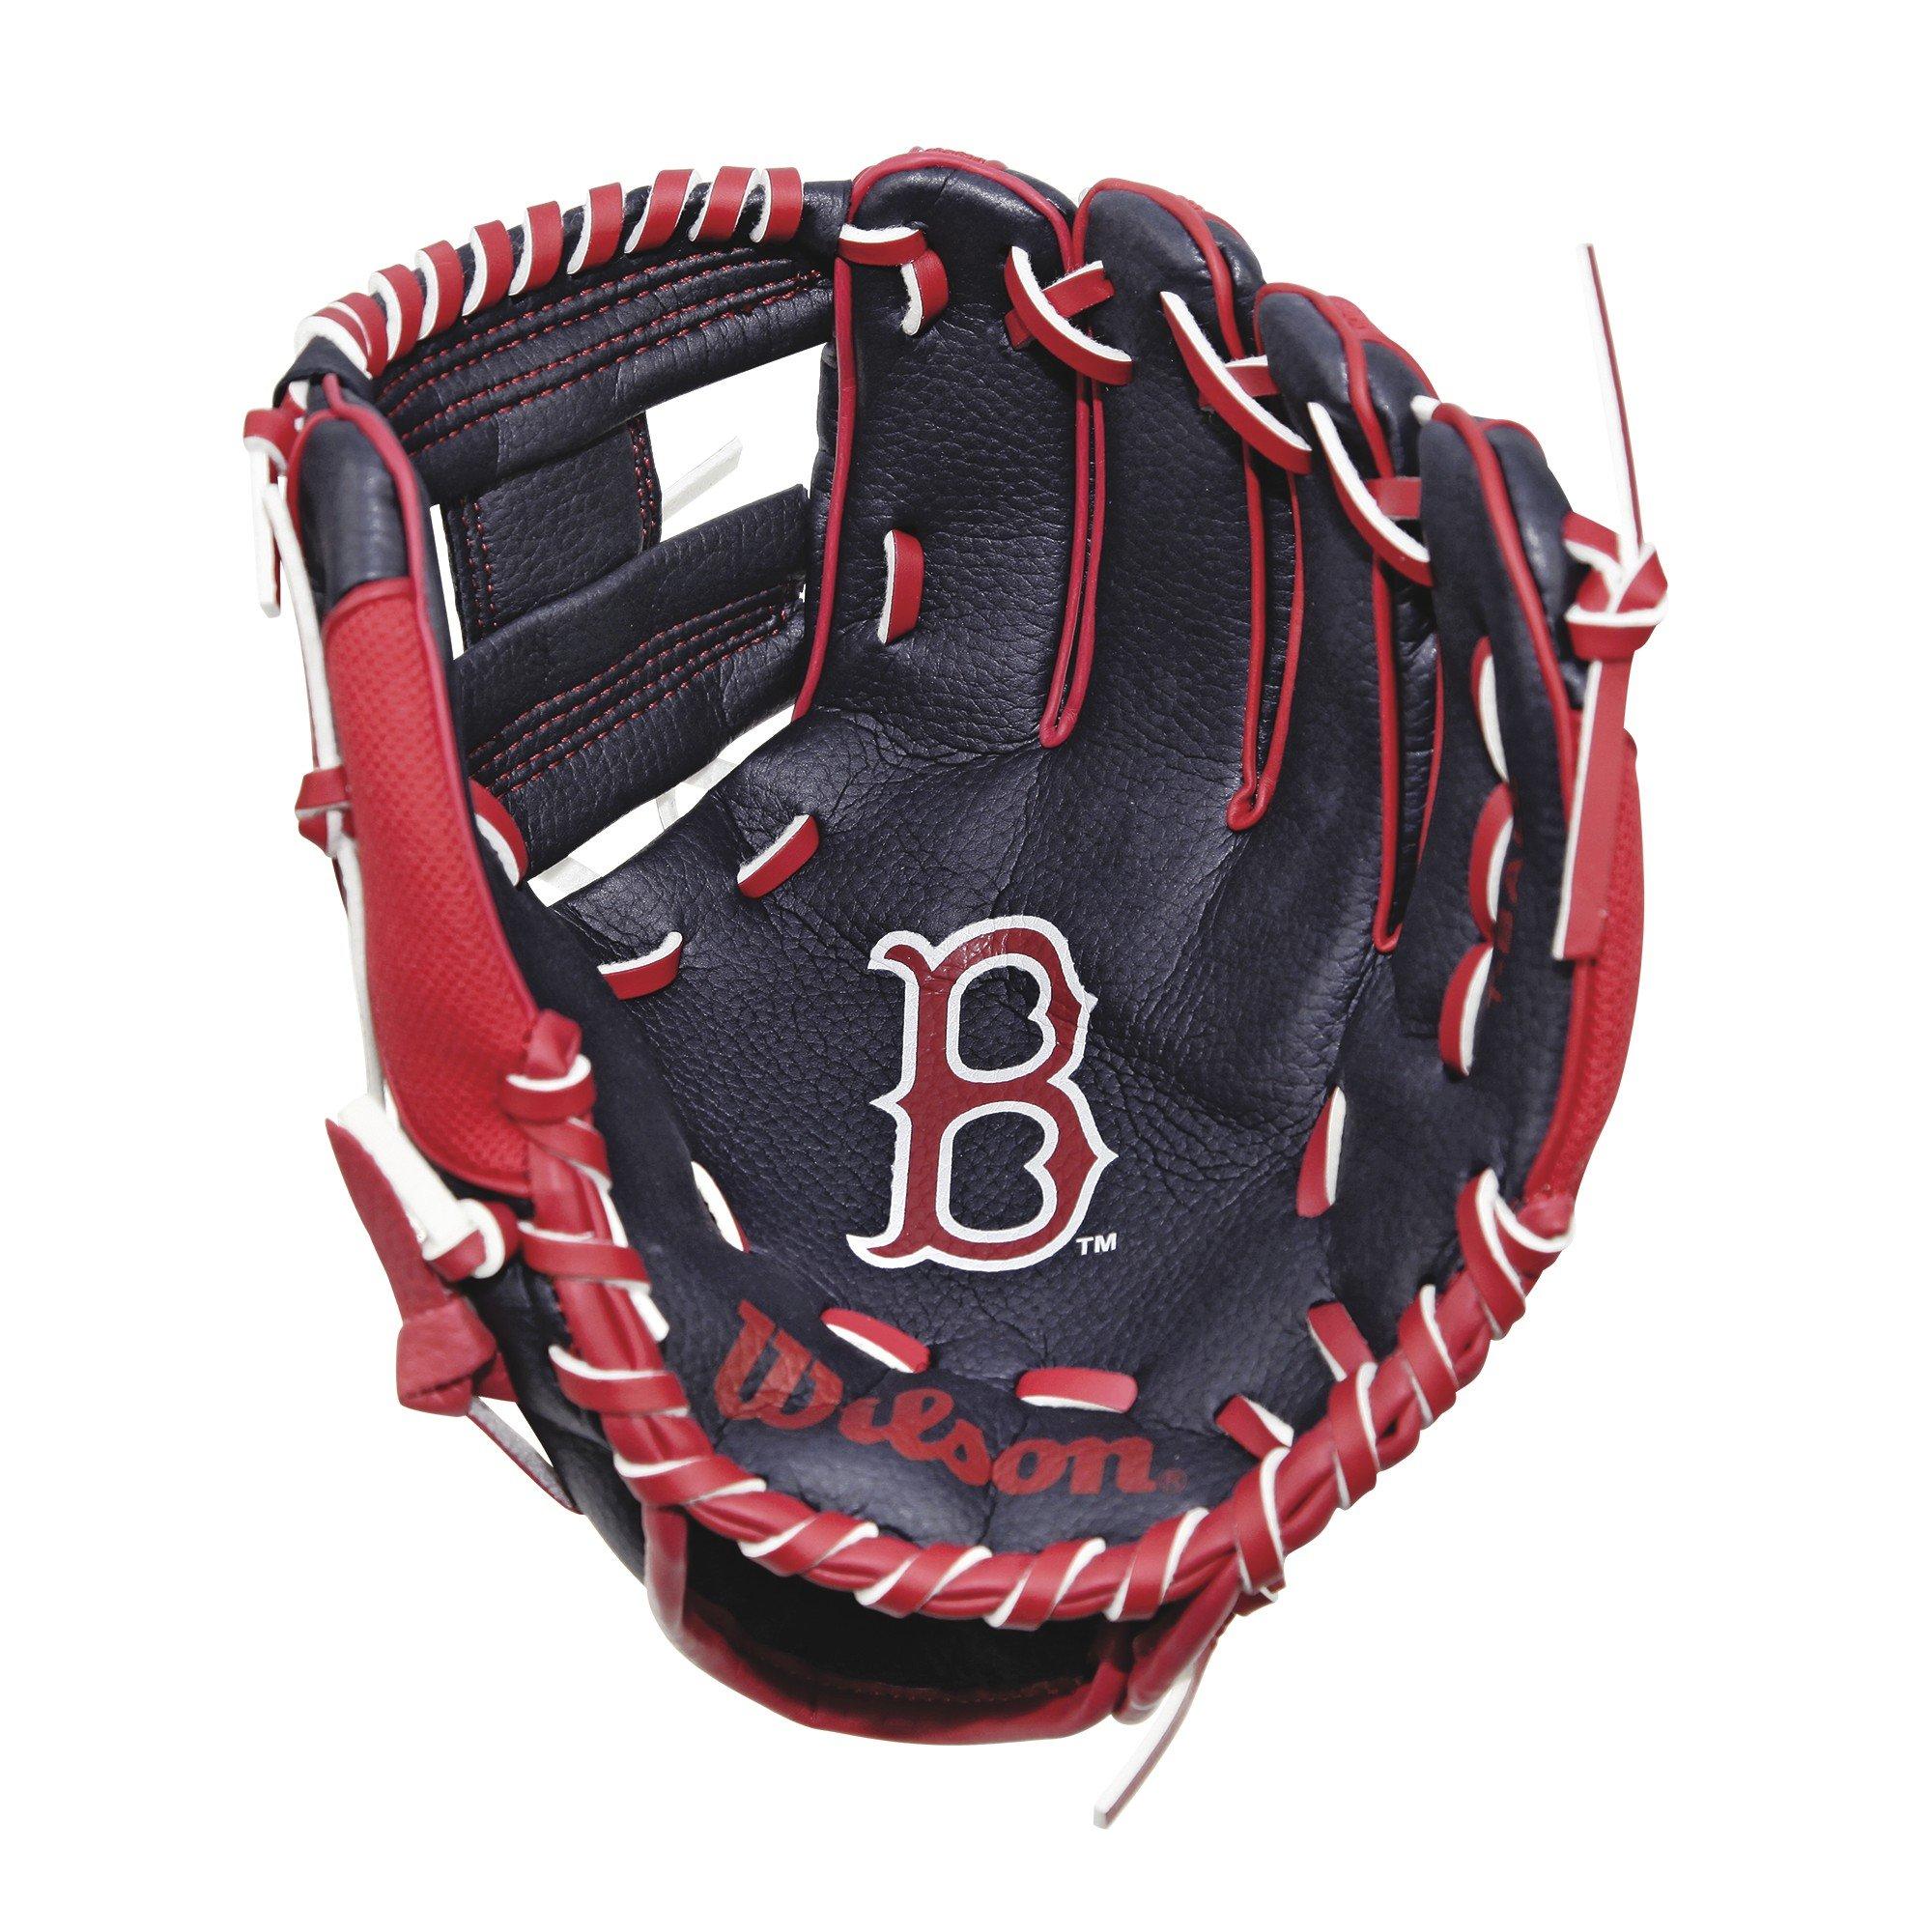 Wilson A0200 Boston Red Sox Baseball Gloves, 10''